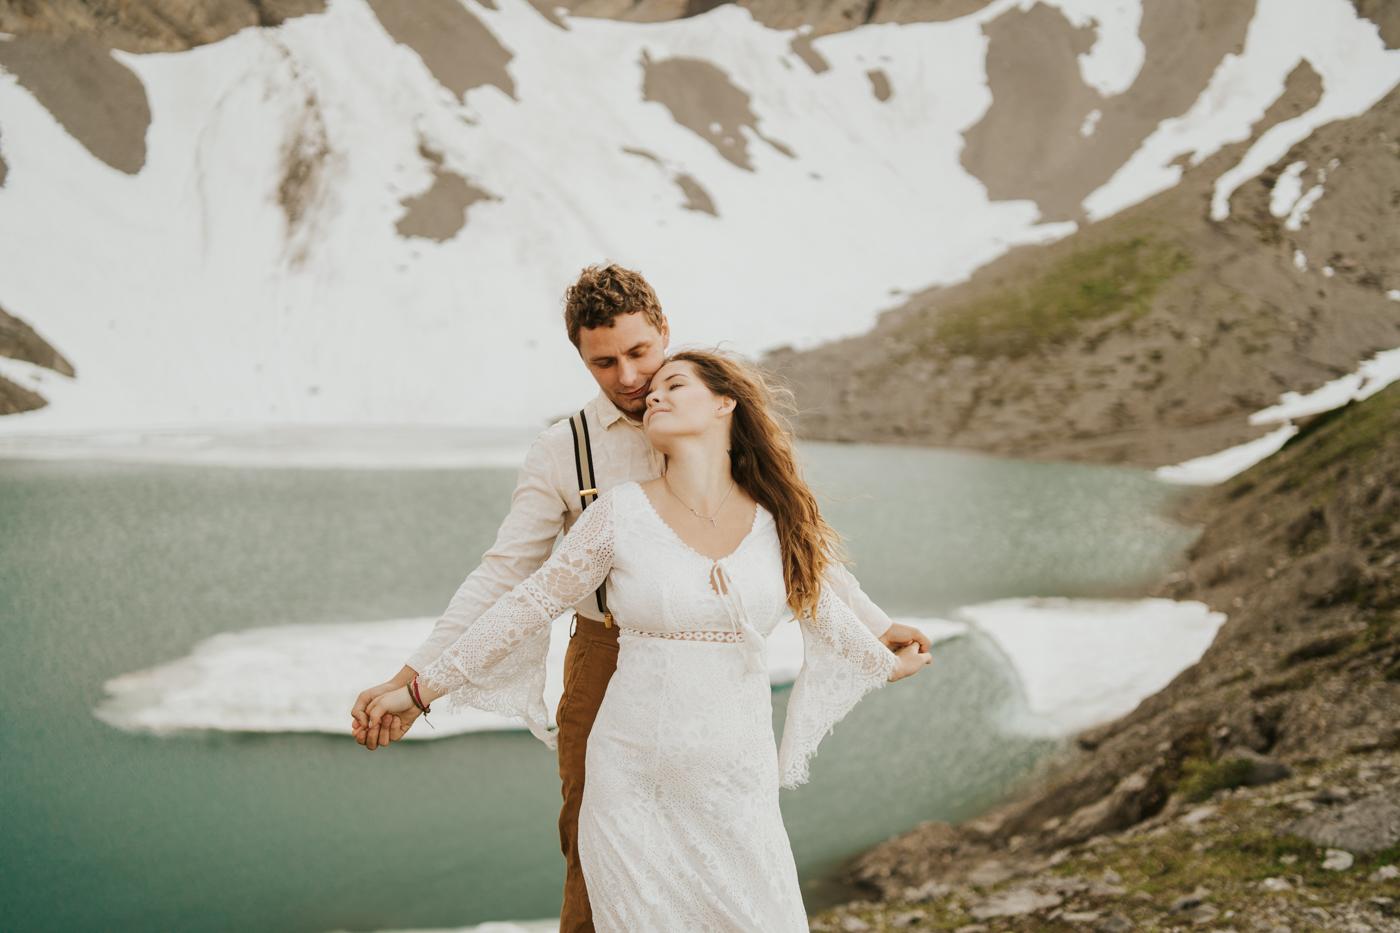 tyraephotography_photographer_wedding_elopement_engagement_photography-07688.jpg